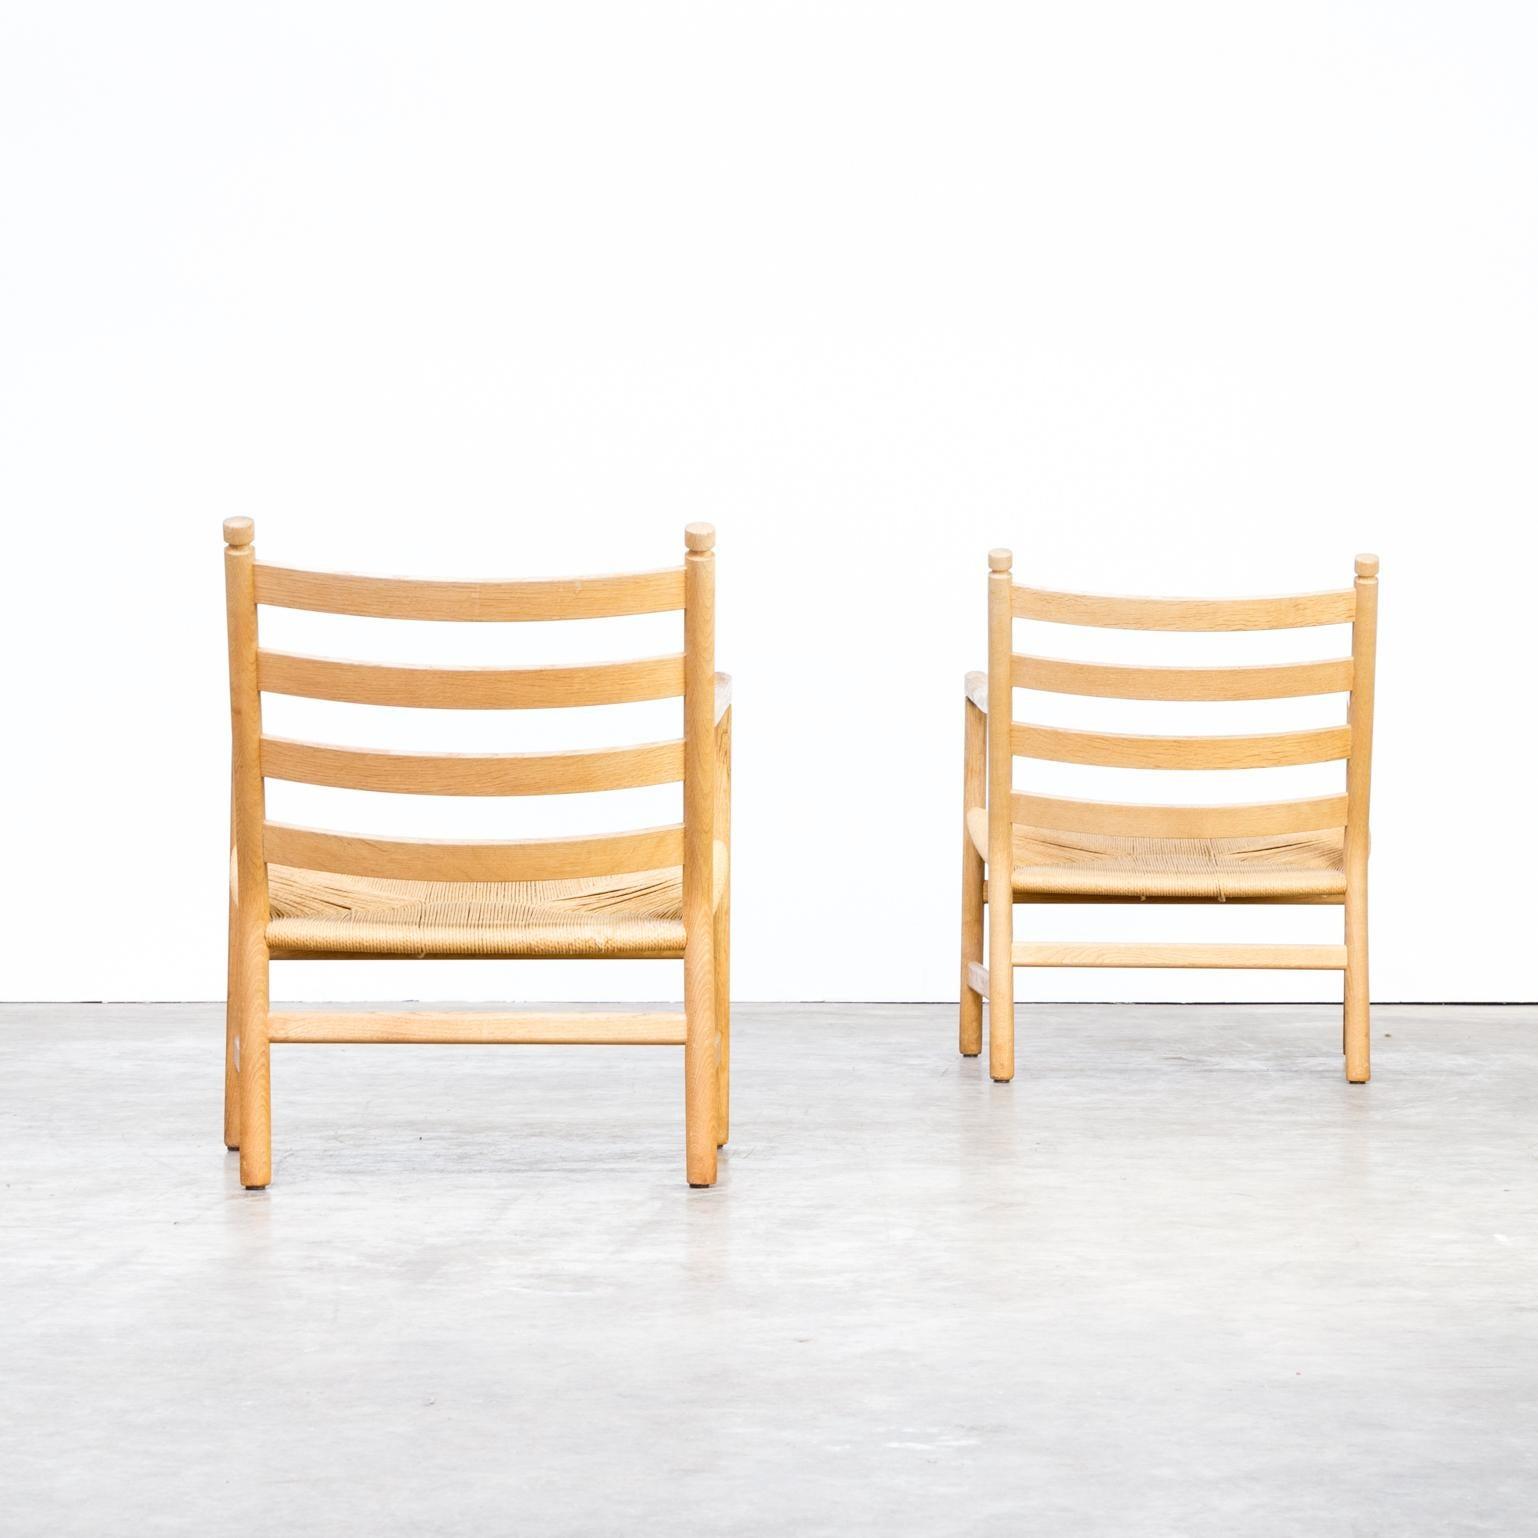 Hans for HansenSøn 'CH44' Carl 1960s Wegner fauteuils fyY76gb